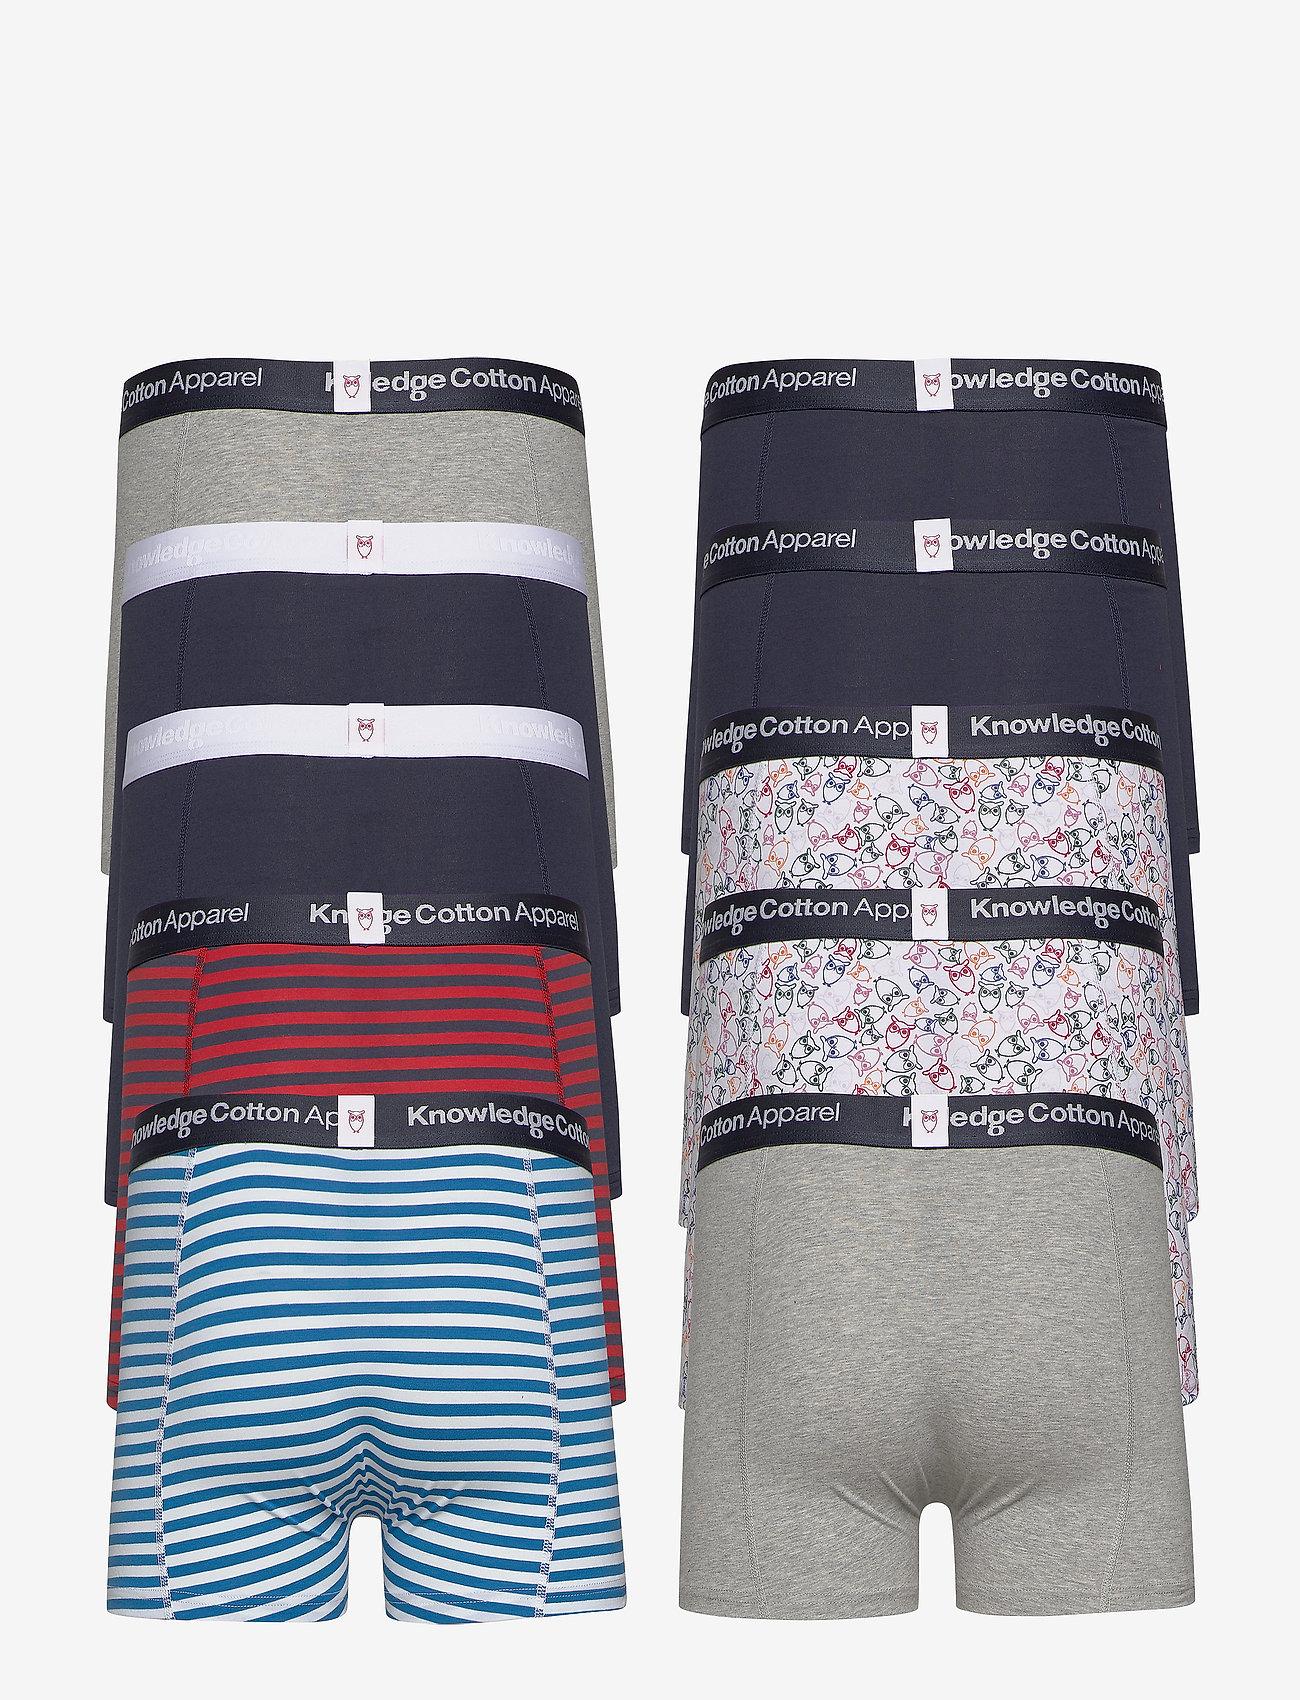 Knowledge Cotton Apparel Maple 10 Pack Underwear - Gots/vega Boxershorts Surf The Web